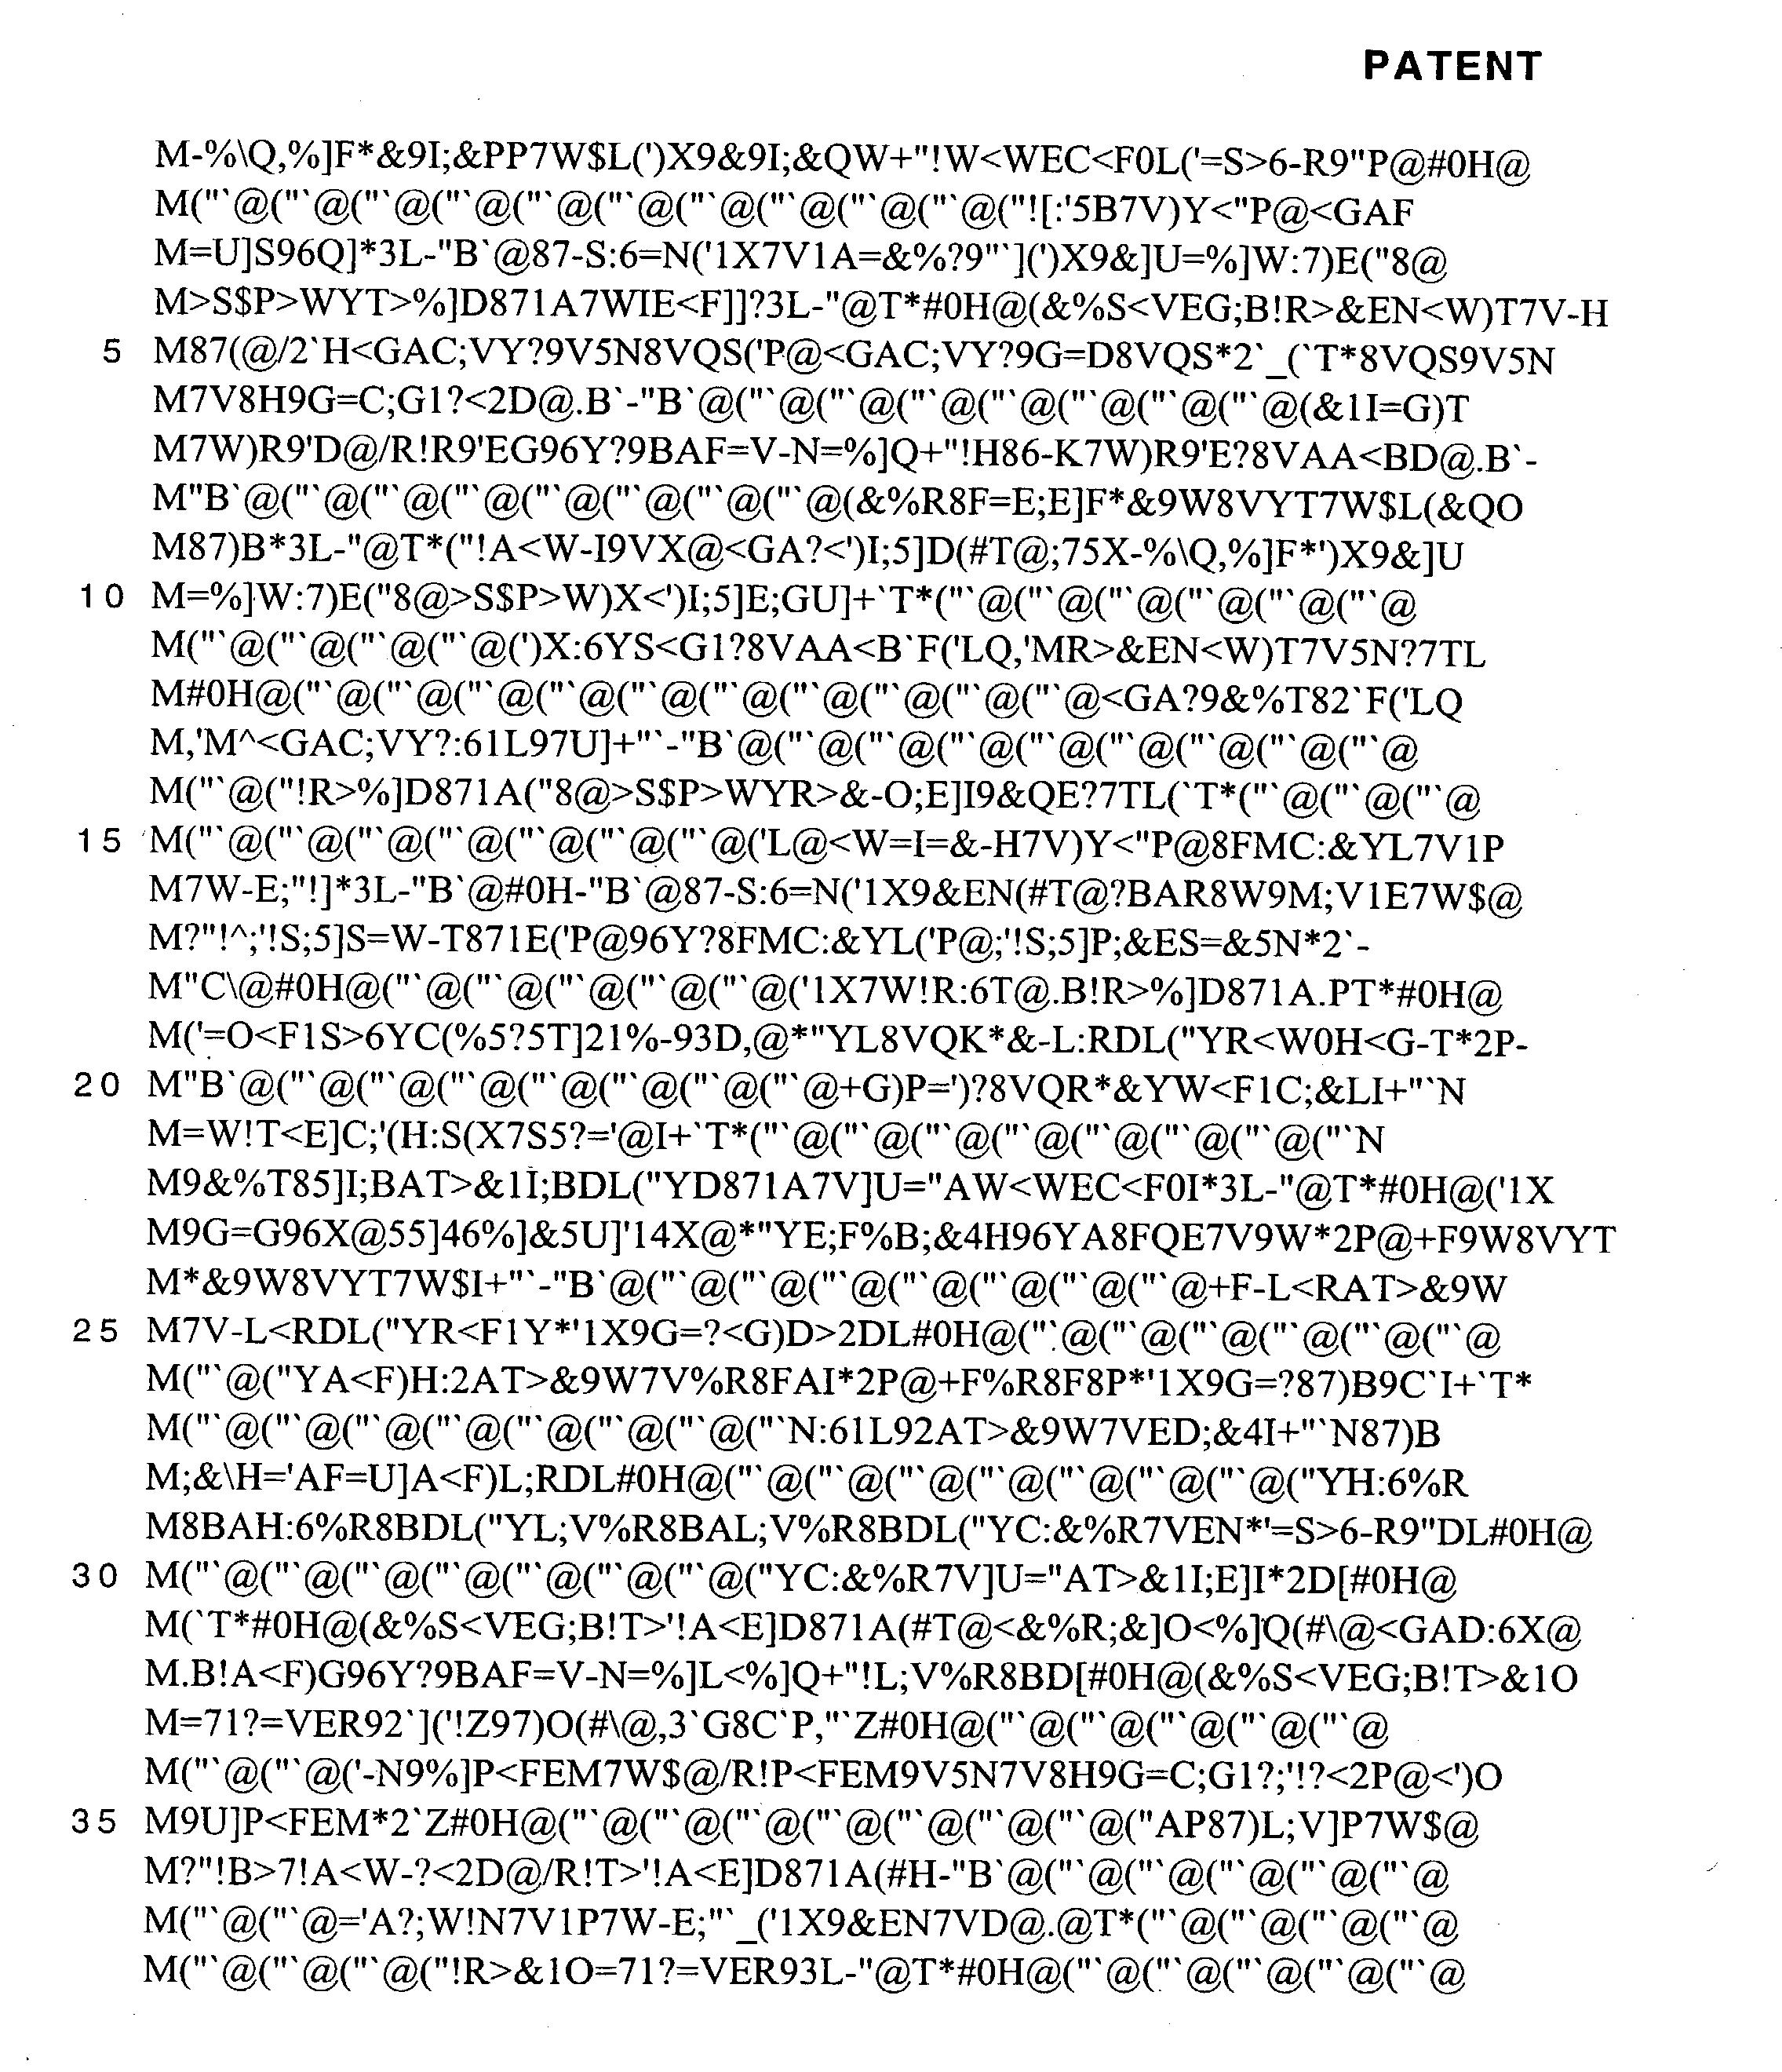 Figure US20030174721A1-20030918-P00043